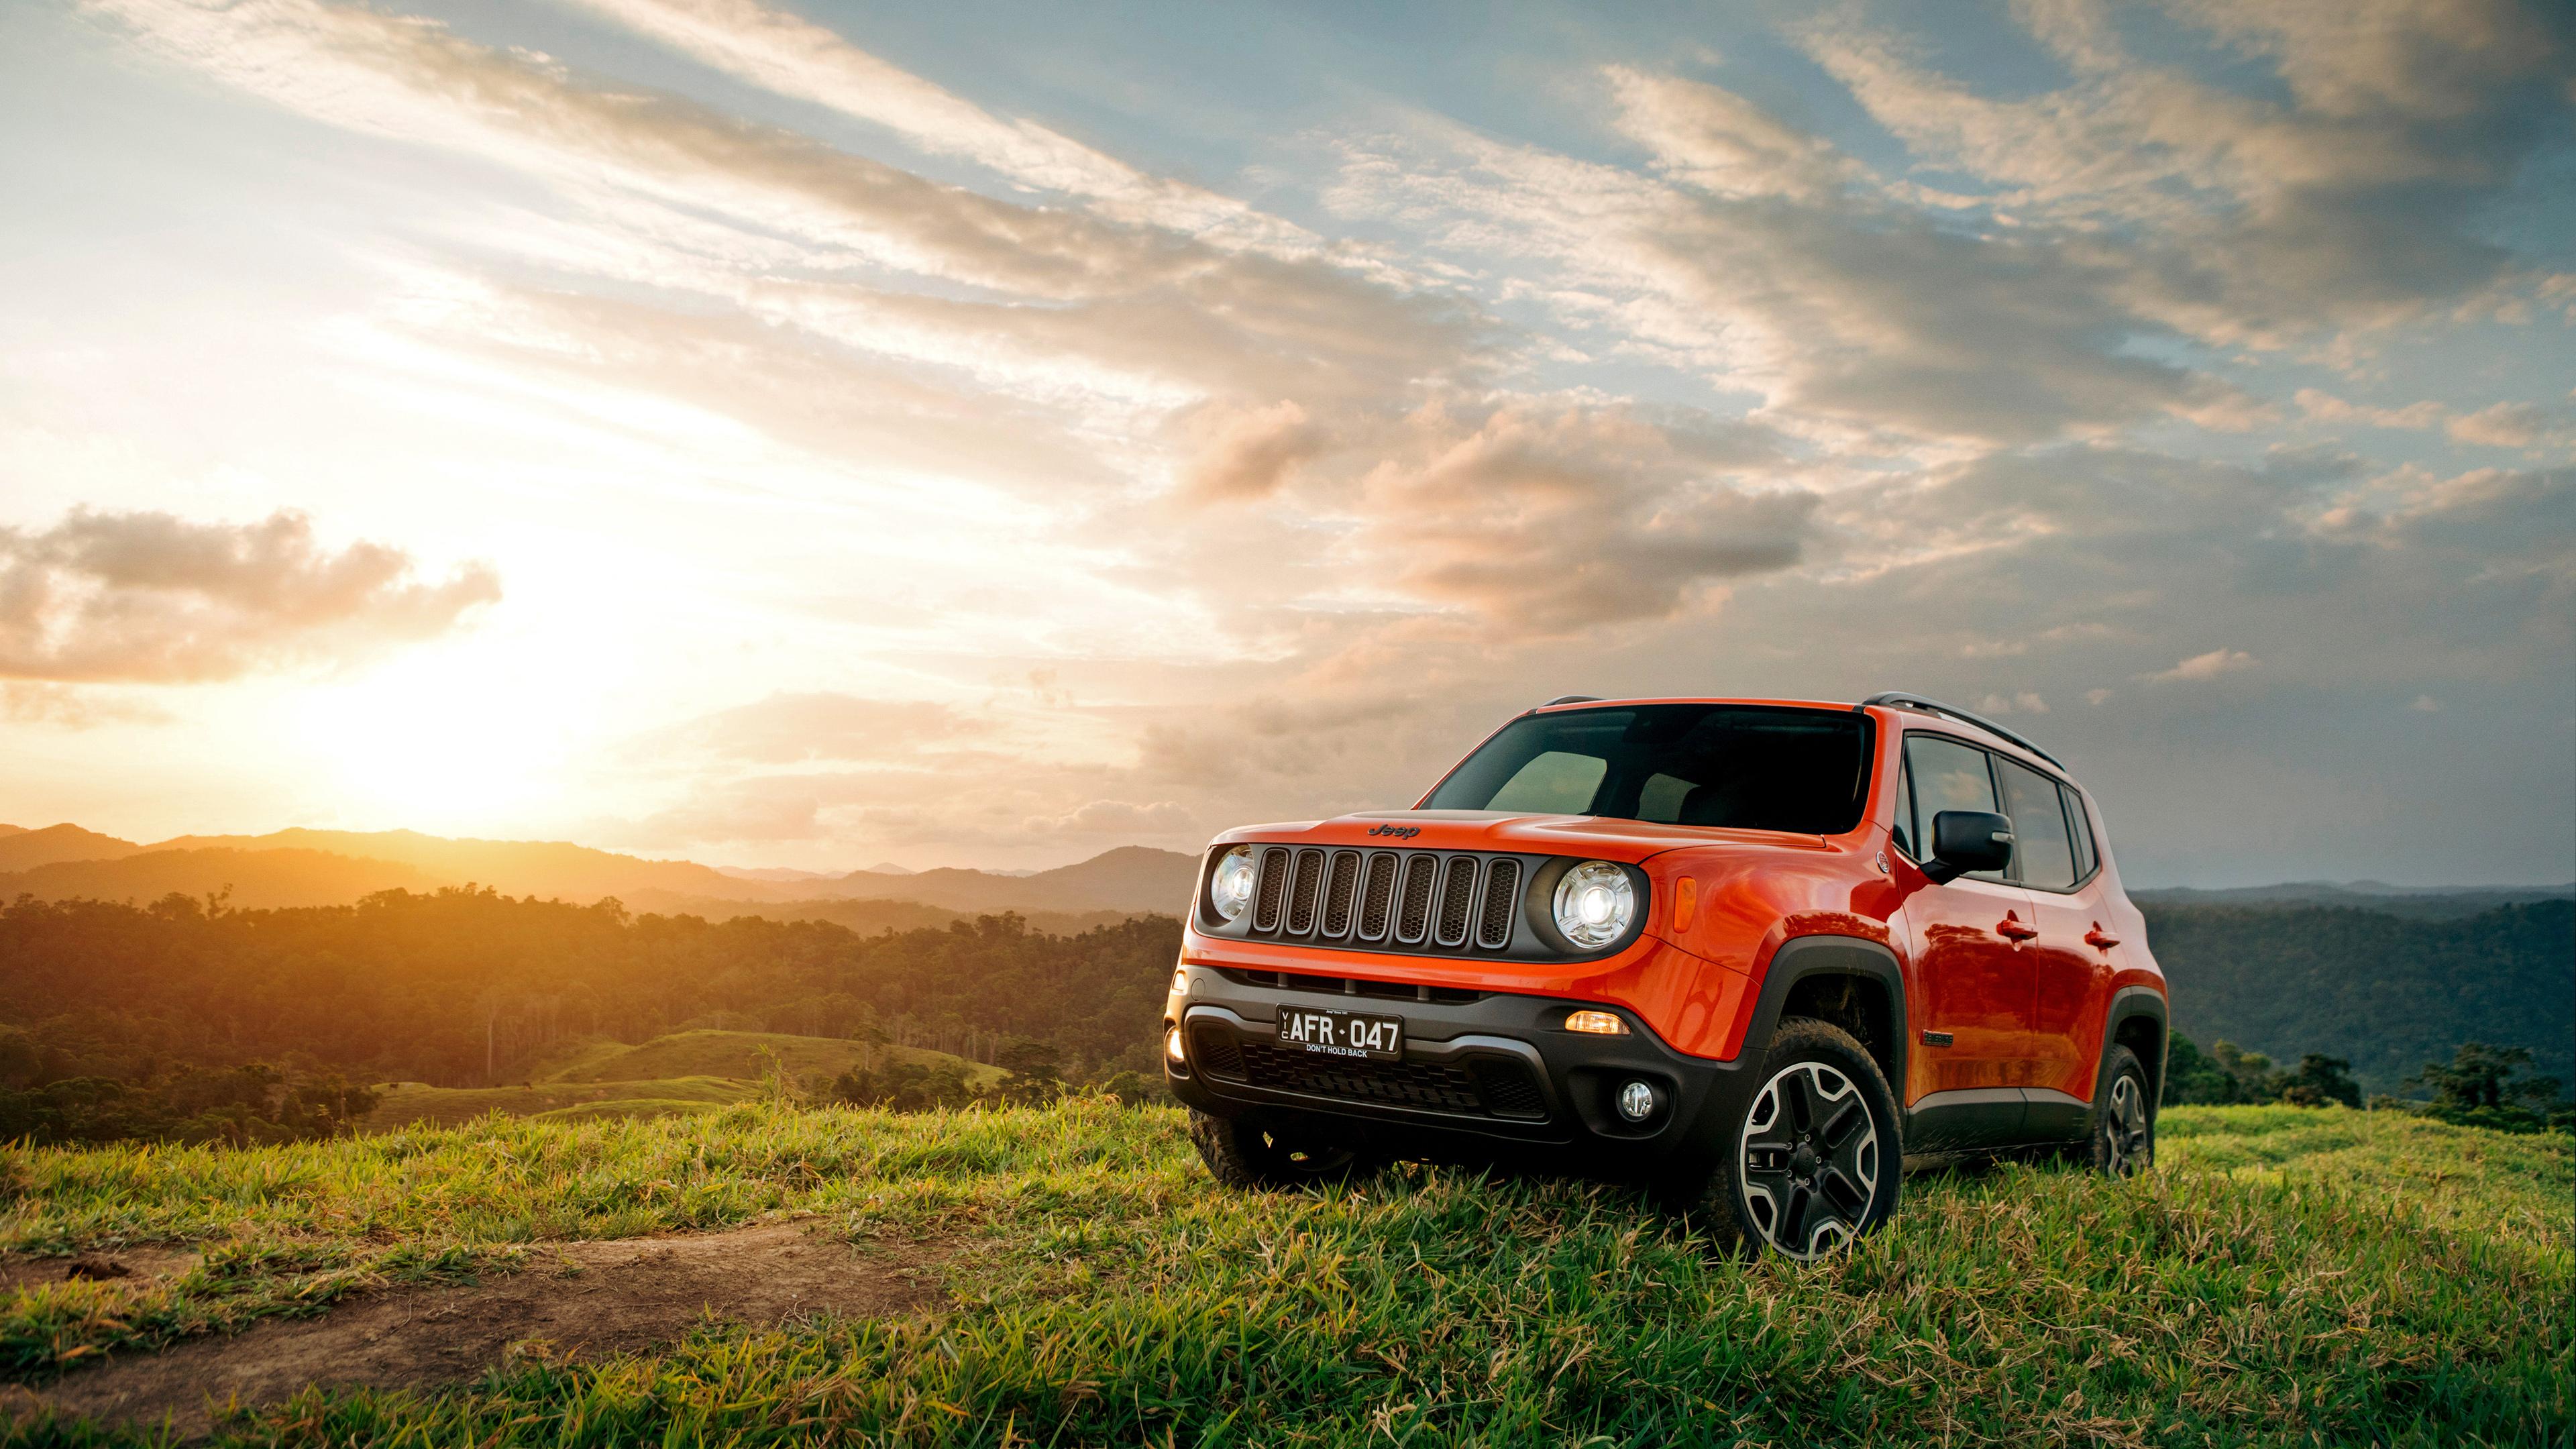 Jeep Renegade Hells Revenge Wallpaper   HD Car Wallpapers ...